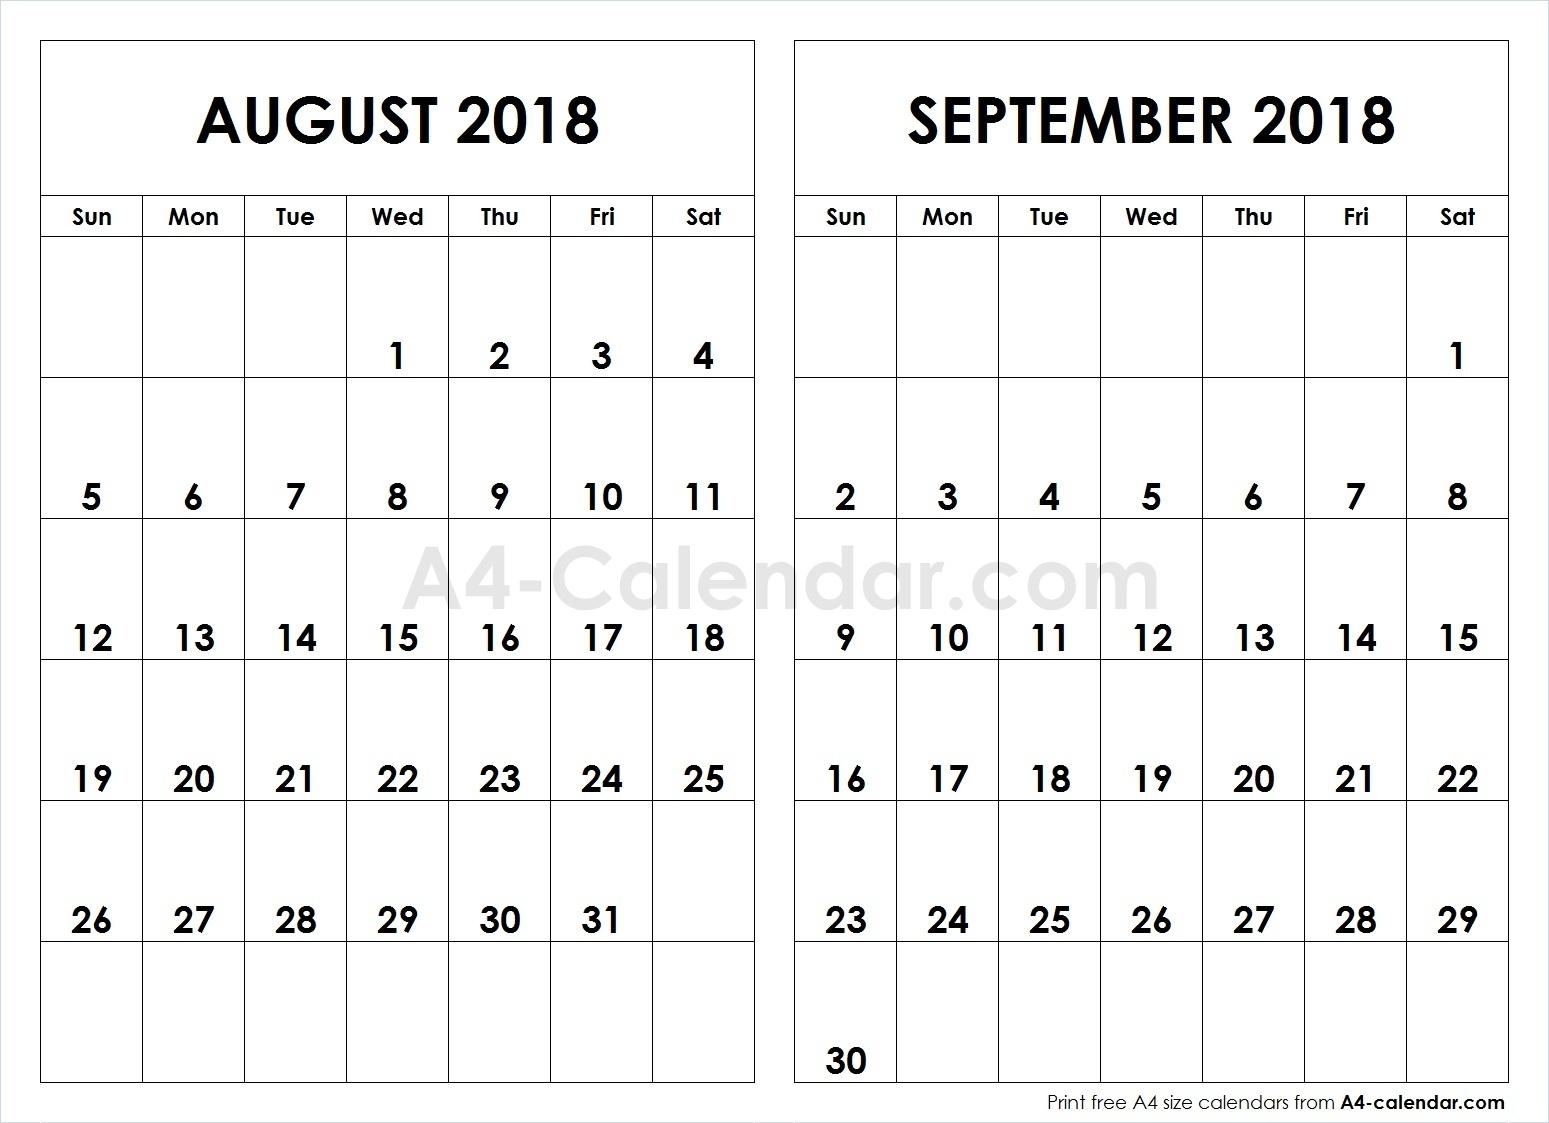 August September 2018 A4 Calendar | 2 Month Calendar Template pertaining to August And September Calendar Printable